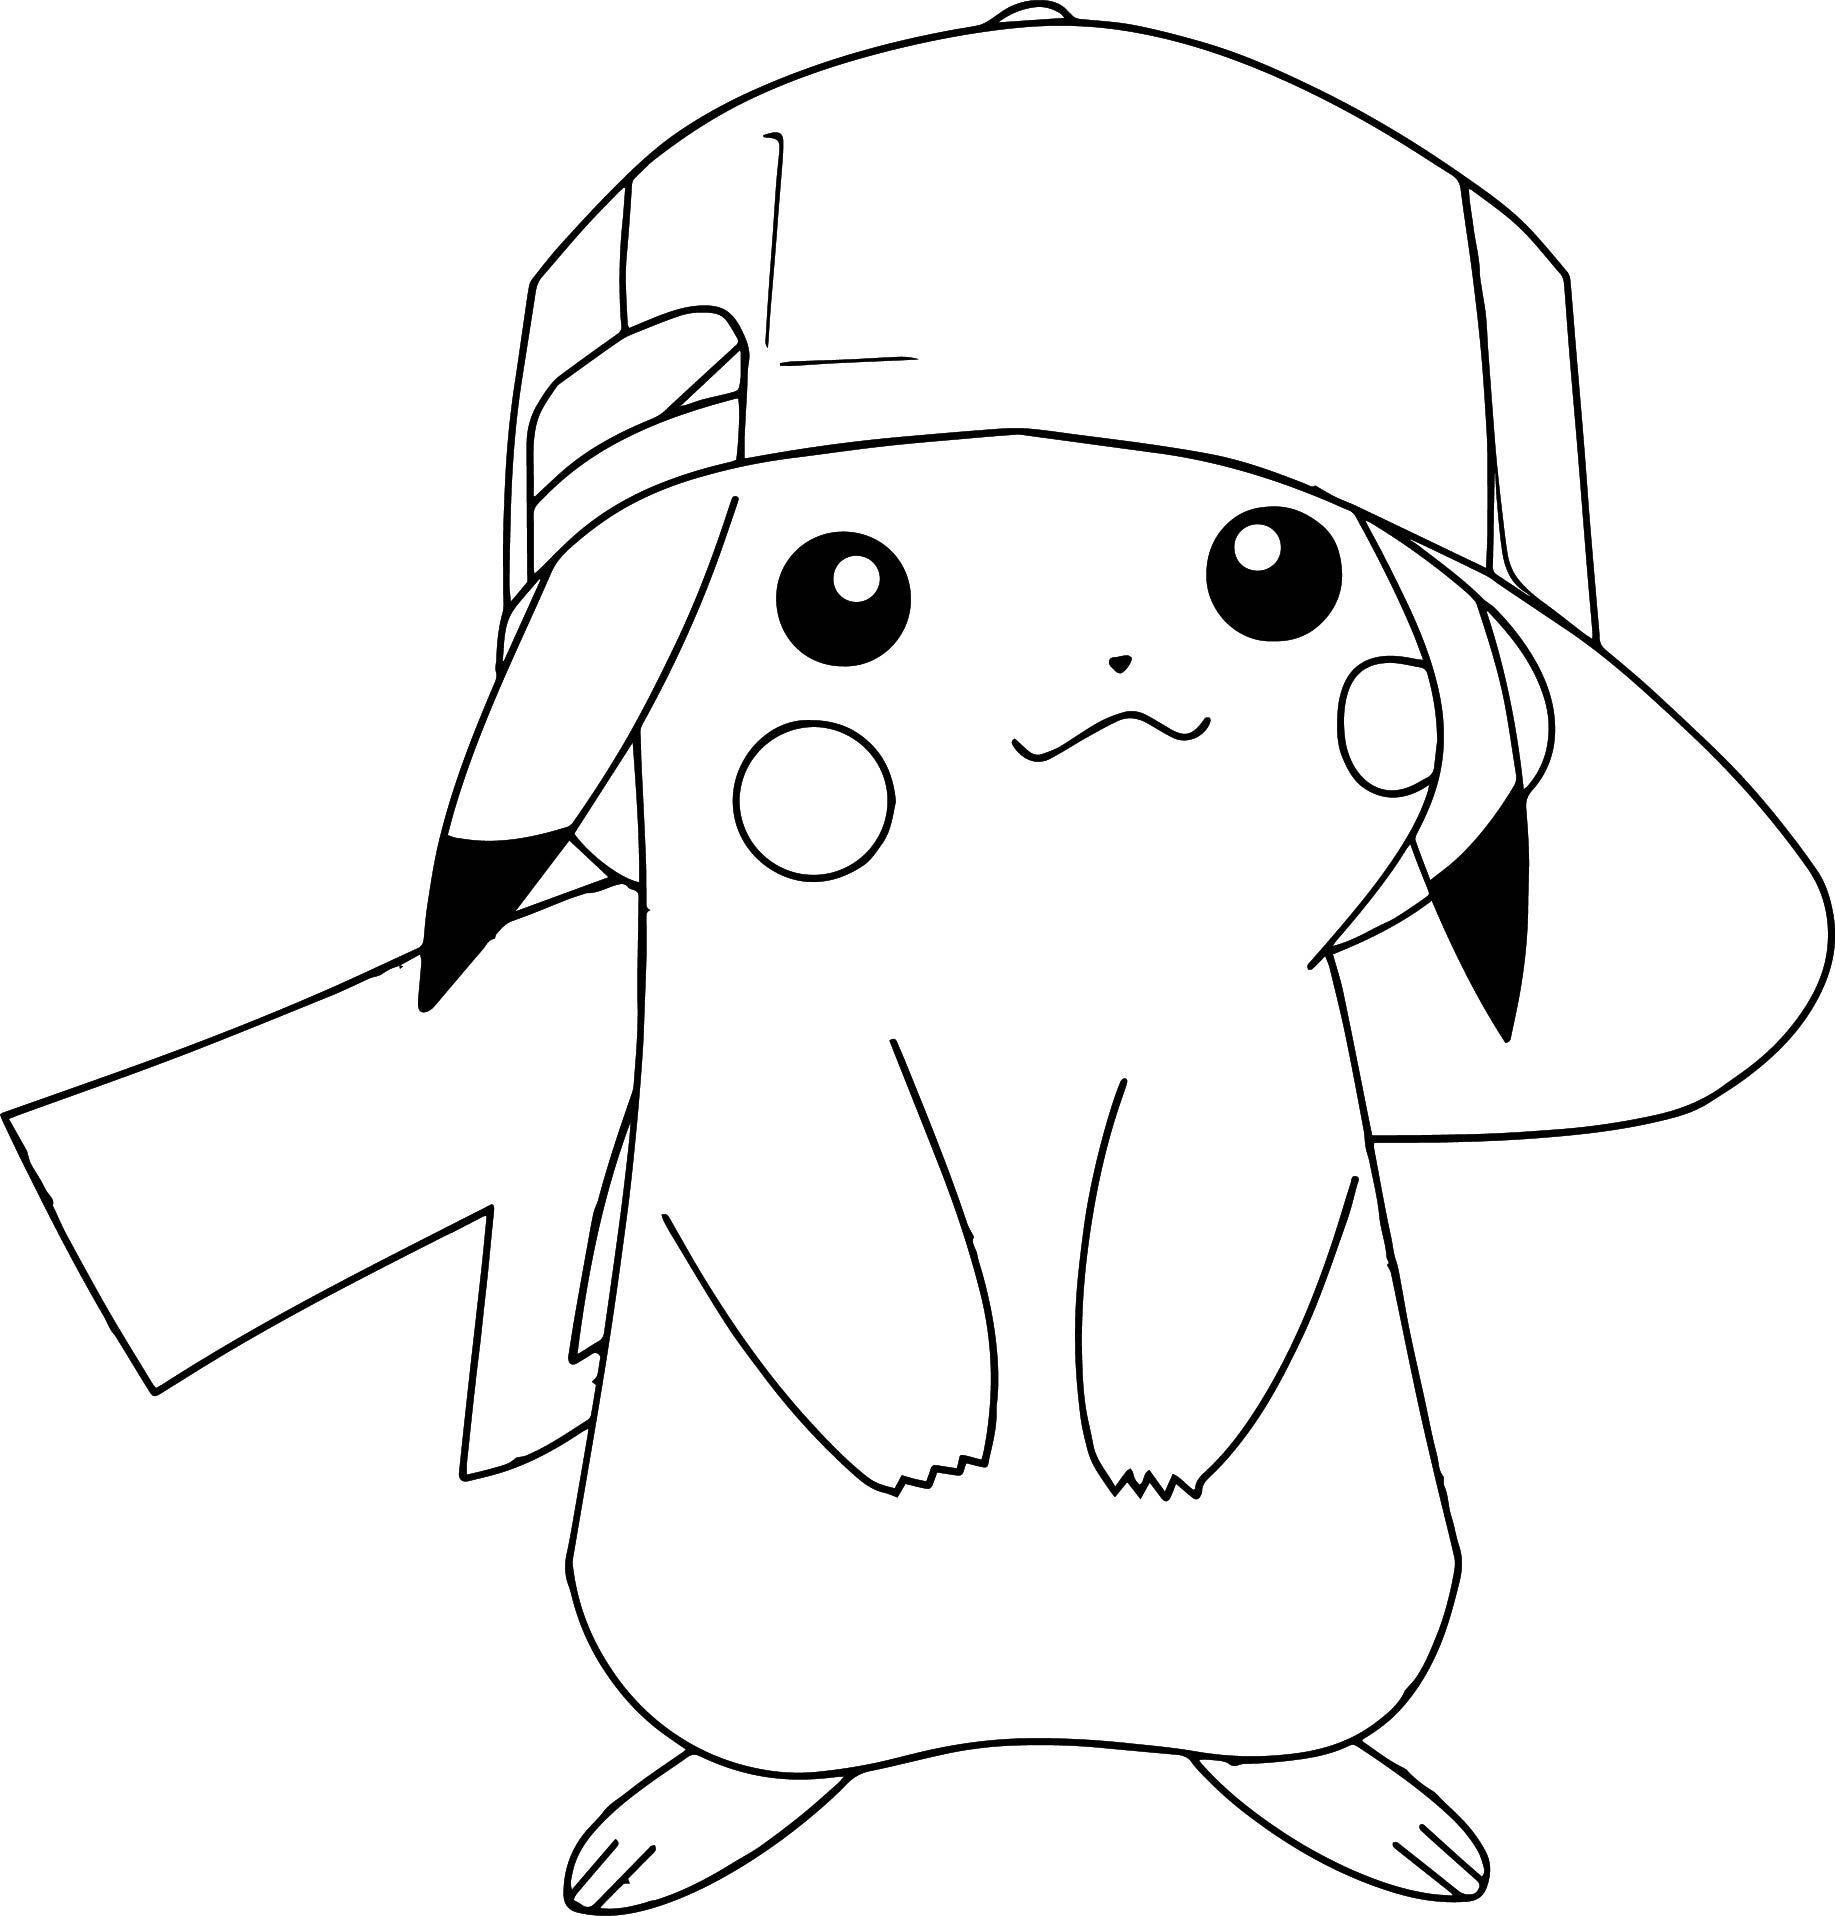 Pokemon Coloring Pages Printable Unique Pokemon Coloring Pages Pikachu Wearing Hat In 2020 Pikachu Coloring Page Cartoon Coloring Pages Pokemon Coloring Pages